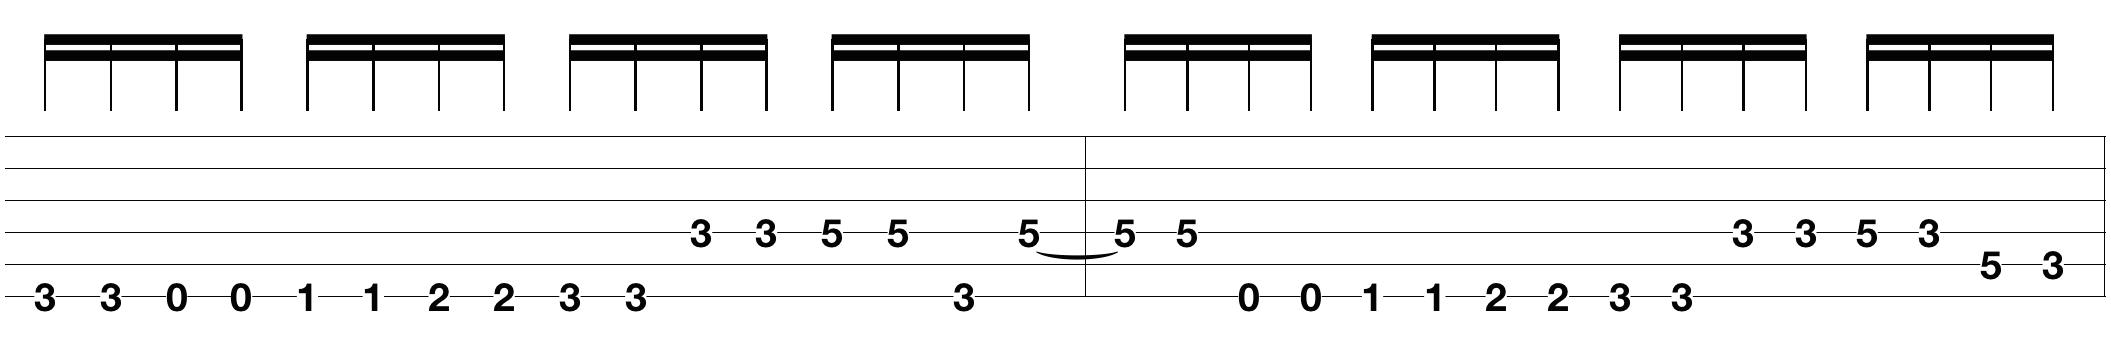 classic-rock-guitar-riffs_2.png